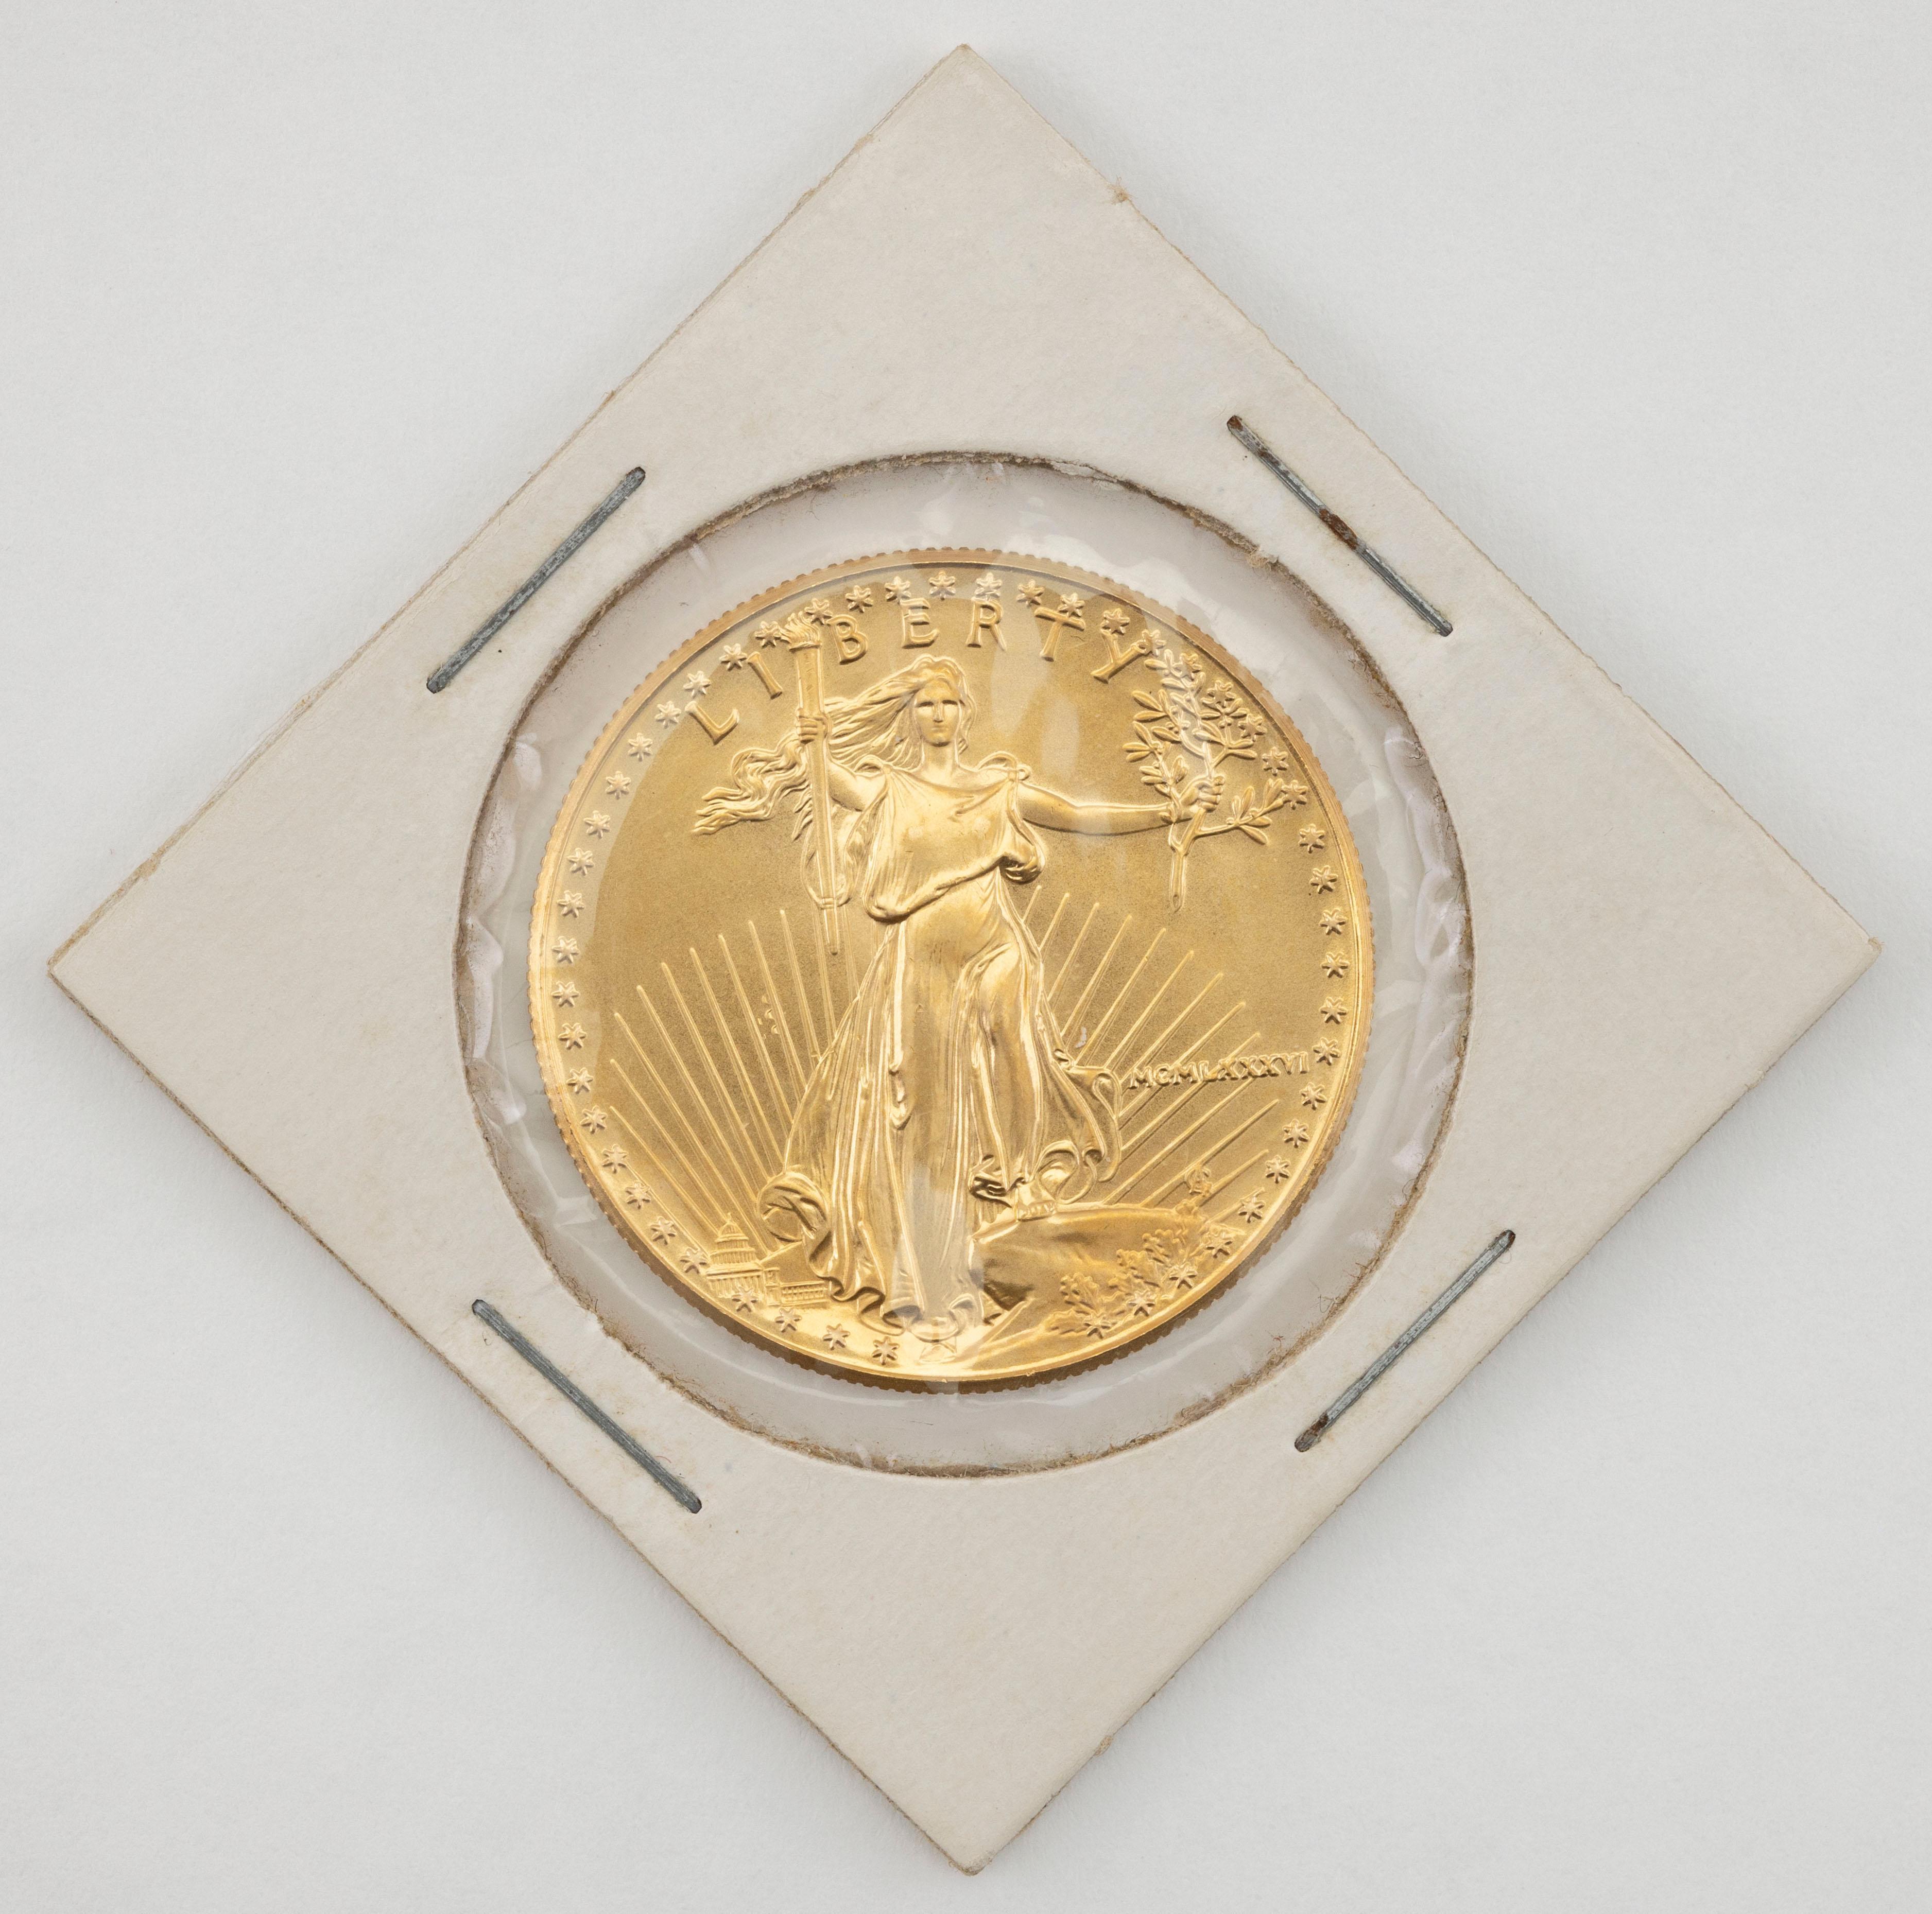 "1986 U.S. FIFTY DOLLAR GOLD COIN Diameter 1.25""."